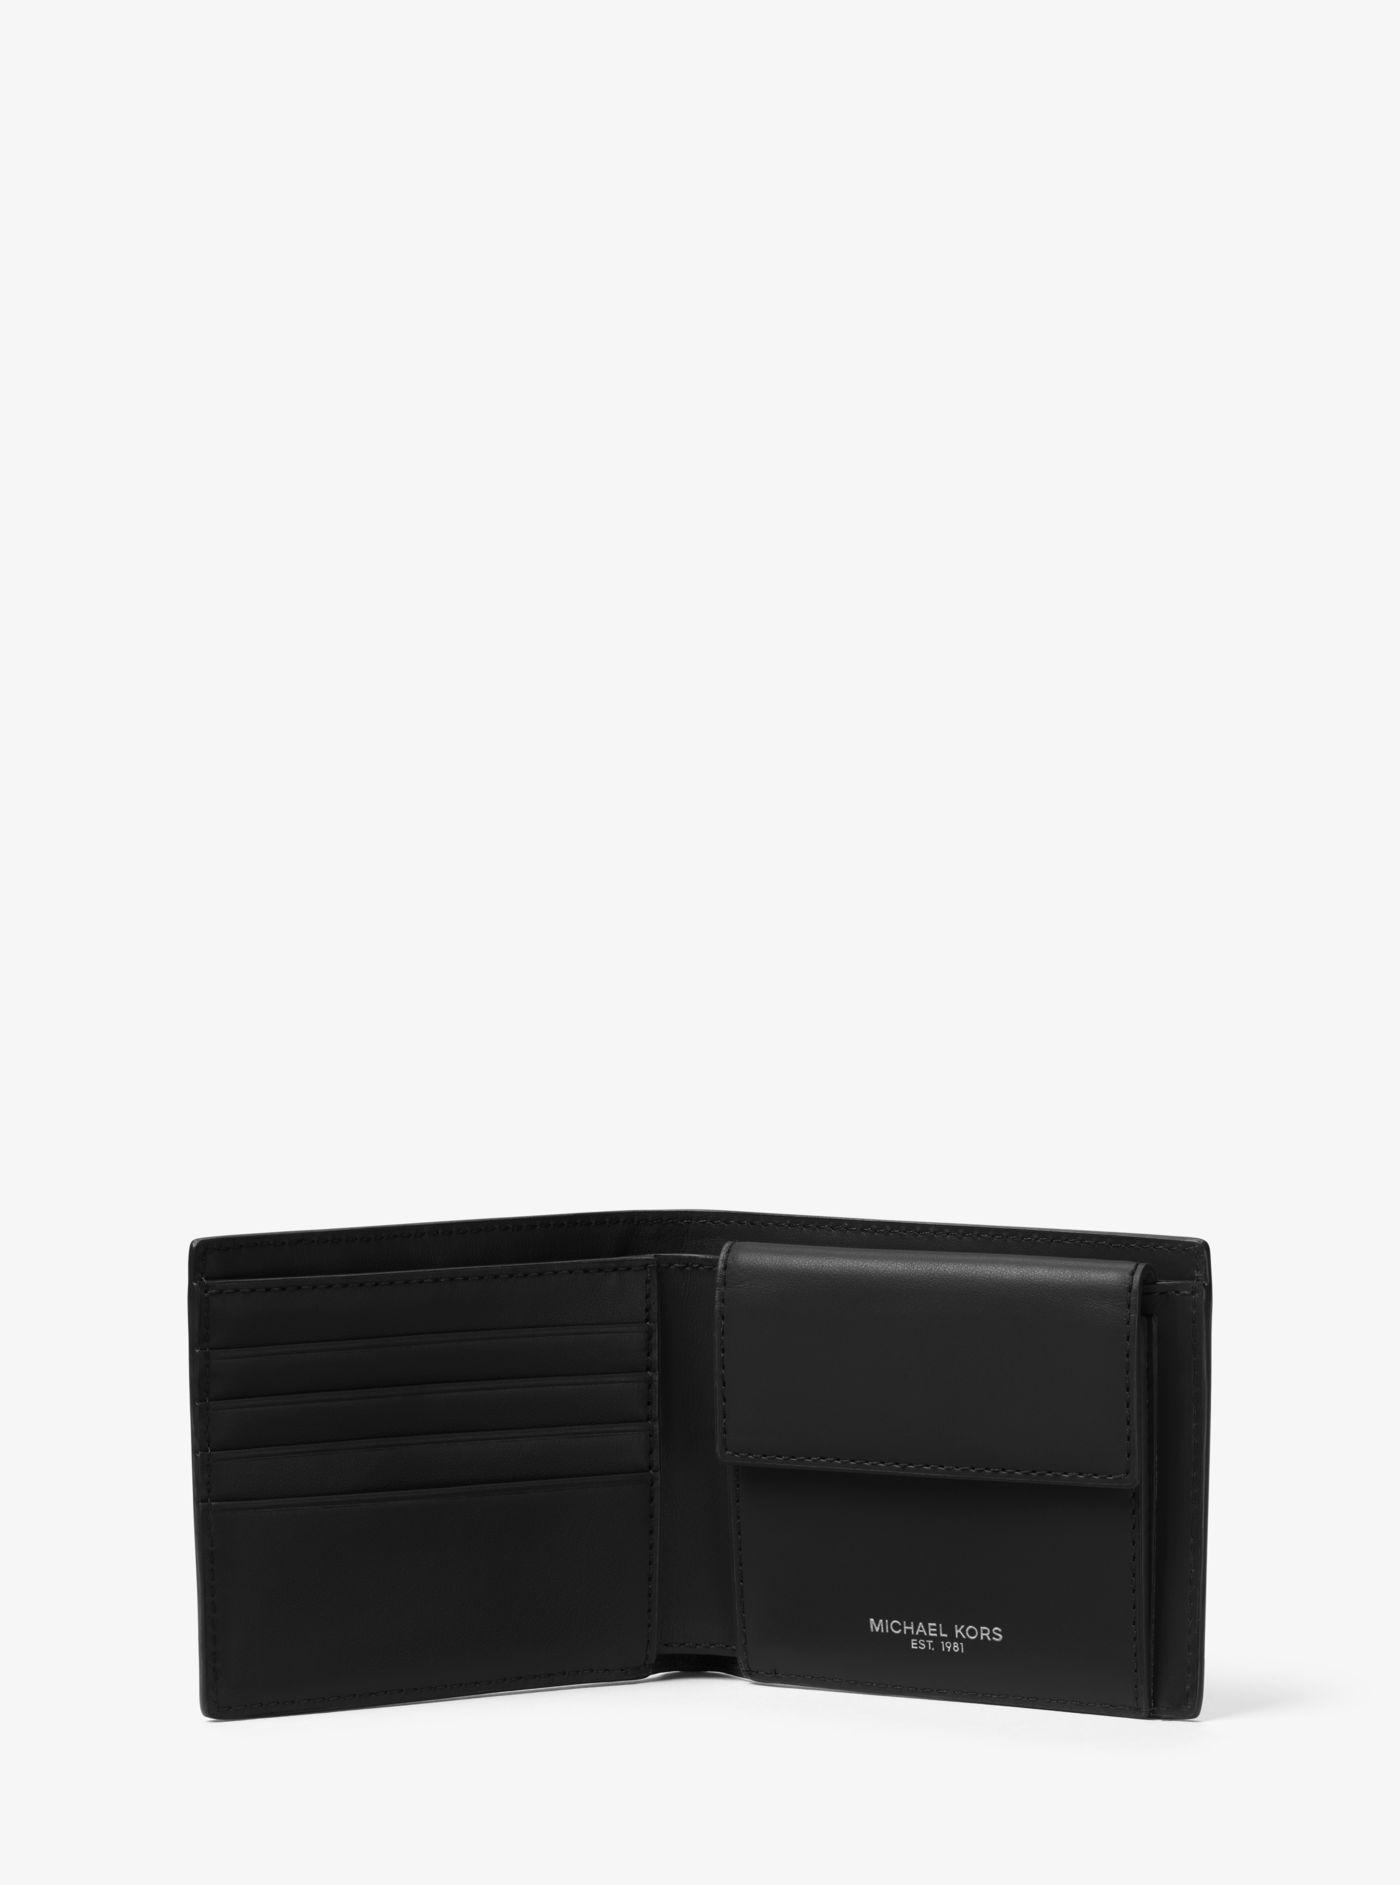 5d5ecd4451dfab Michael Kors Odin Leather Billfold Wallet In Black For Men Lyst